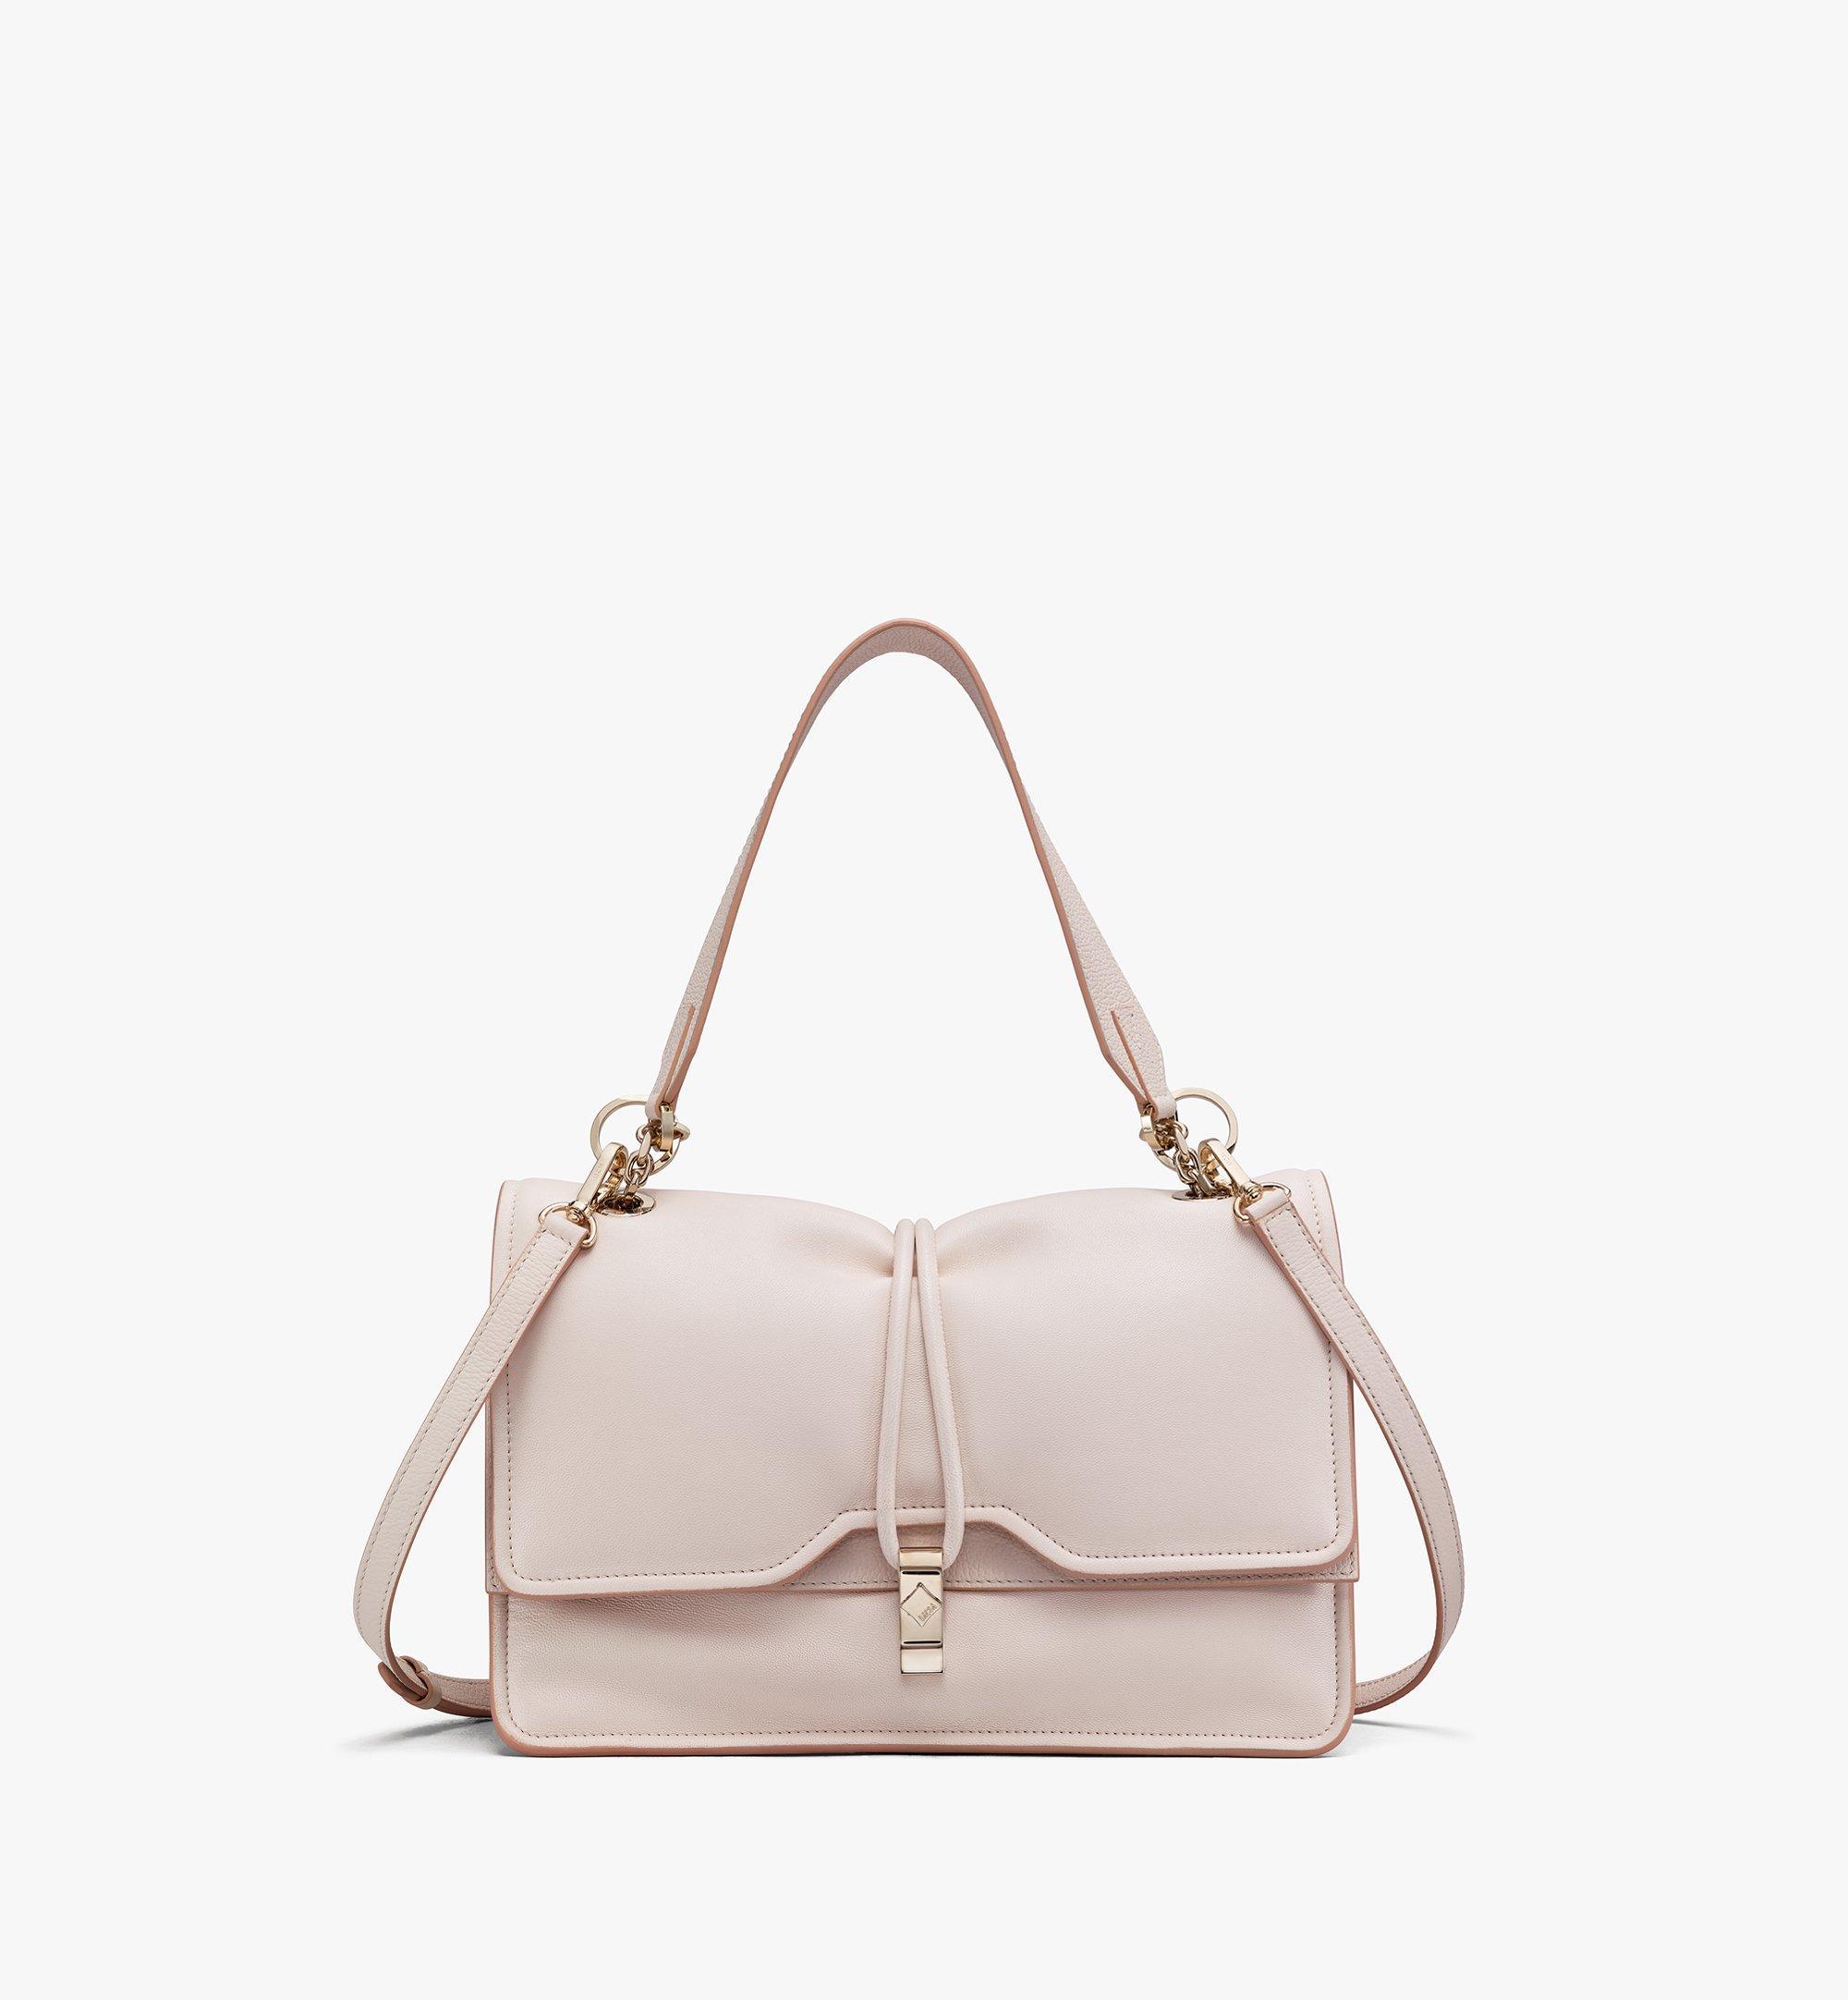 MCM Candy Shoulder Bag in Nappa Leather Beige MWSASCY04IH001 Alternate View 1